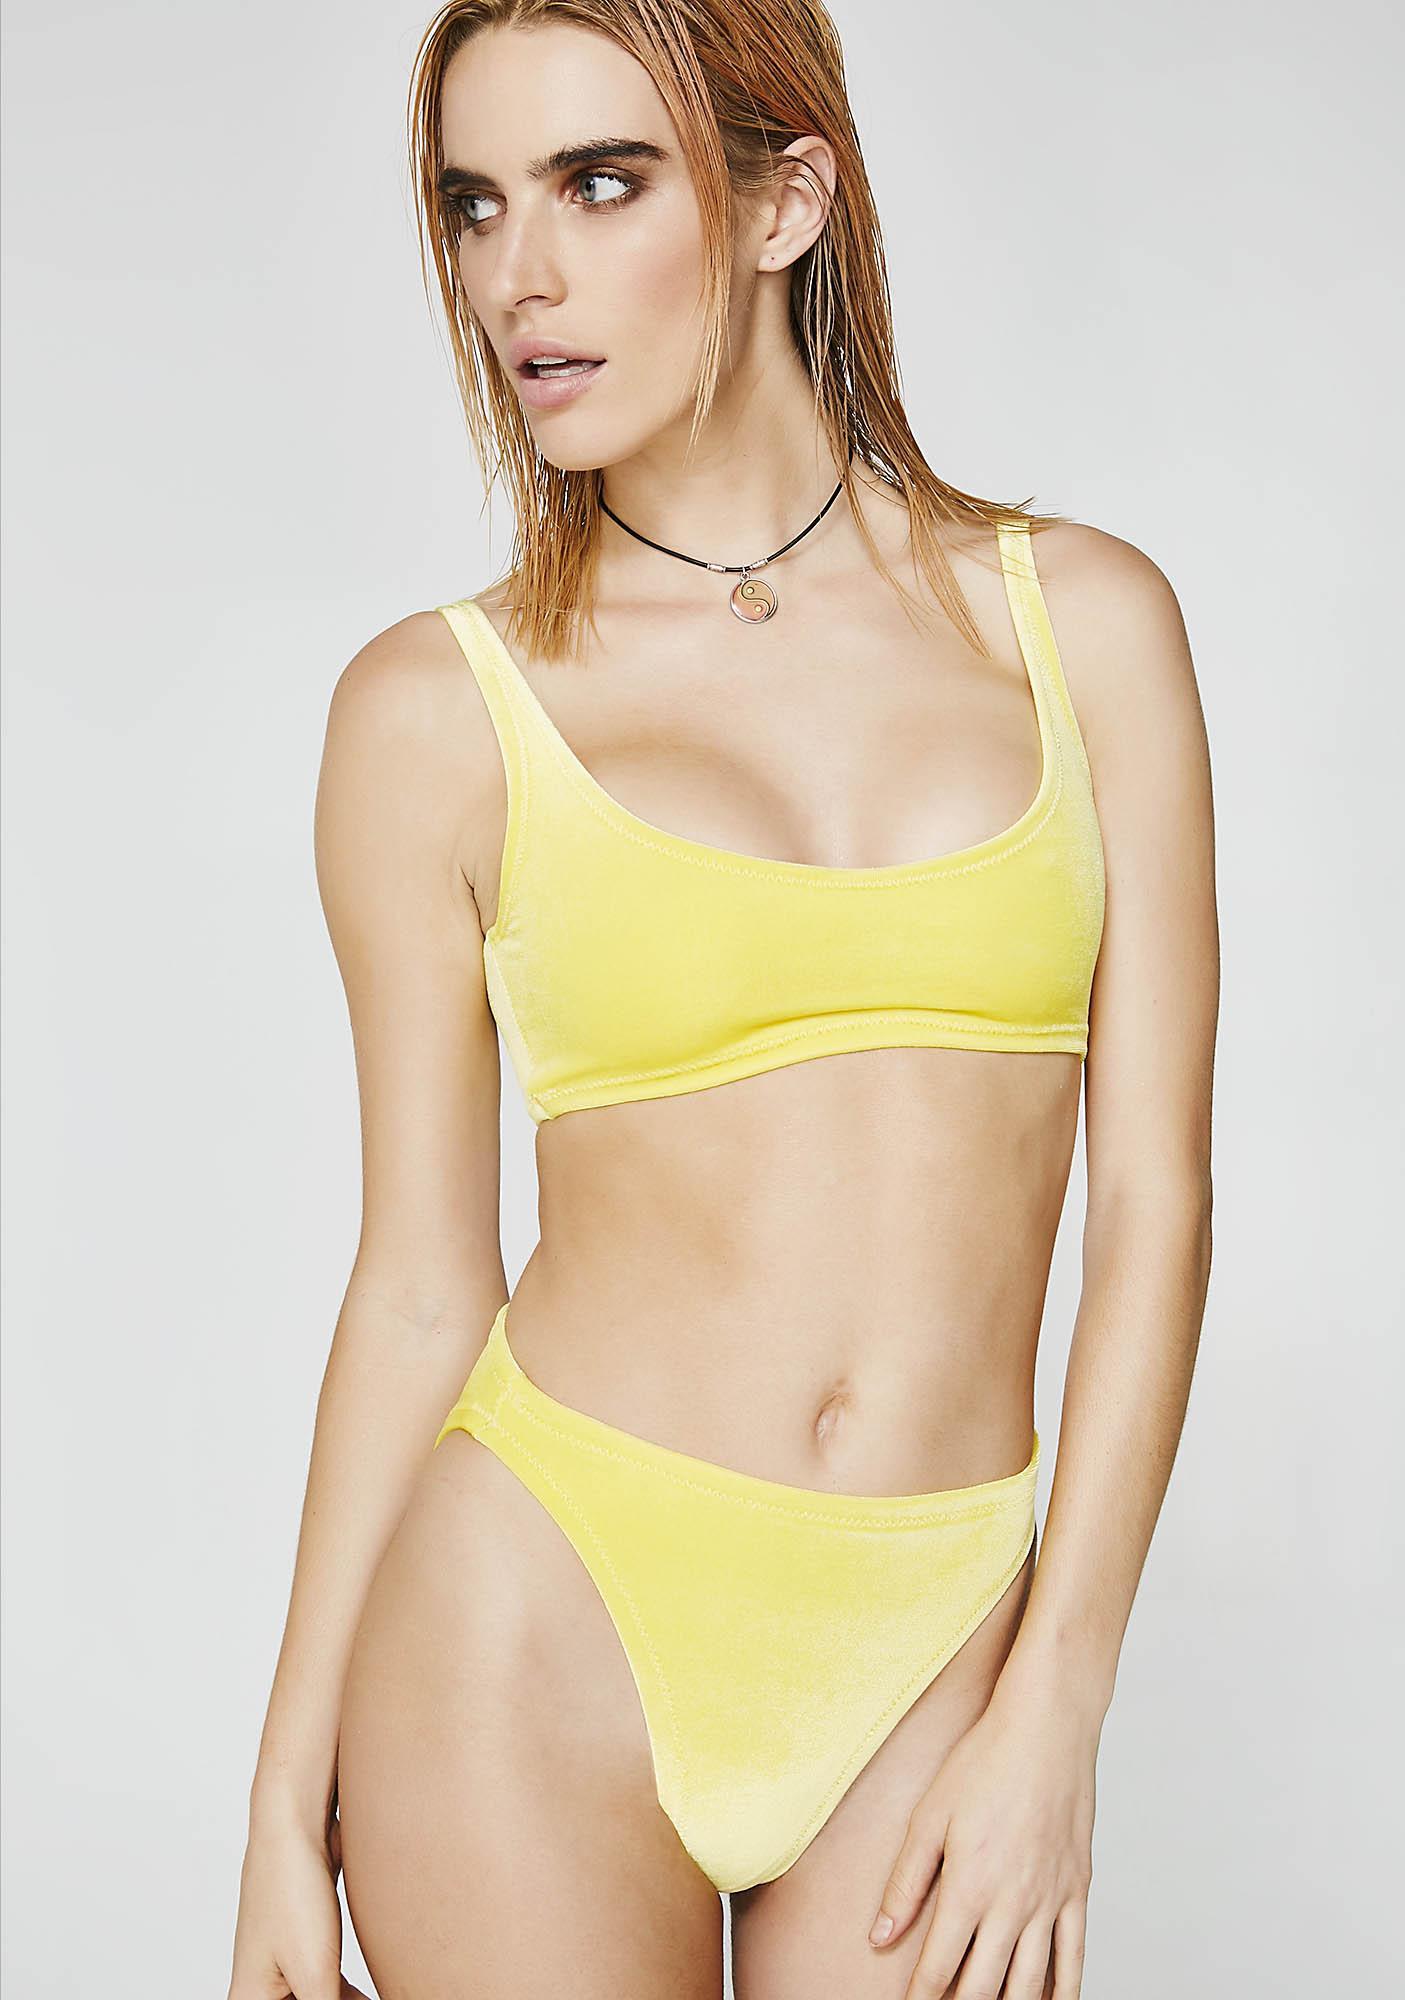 Stardust Swim Sunny Velvet Bikini Set